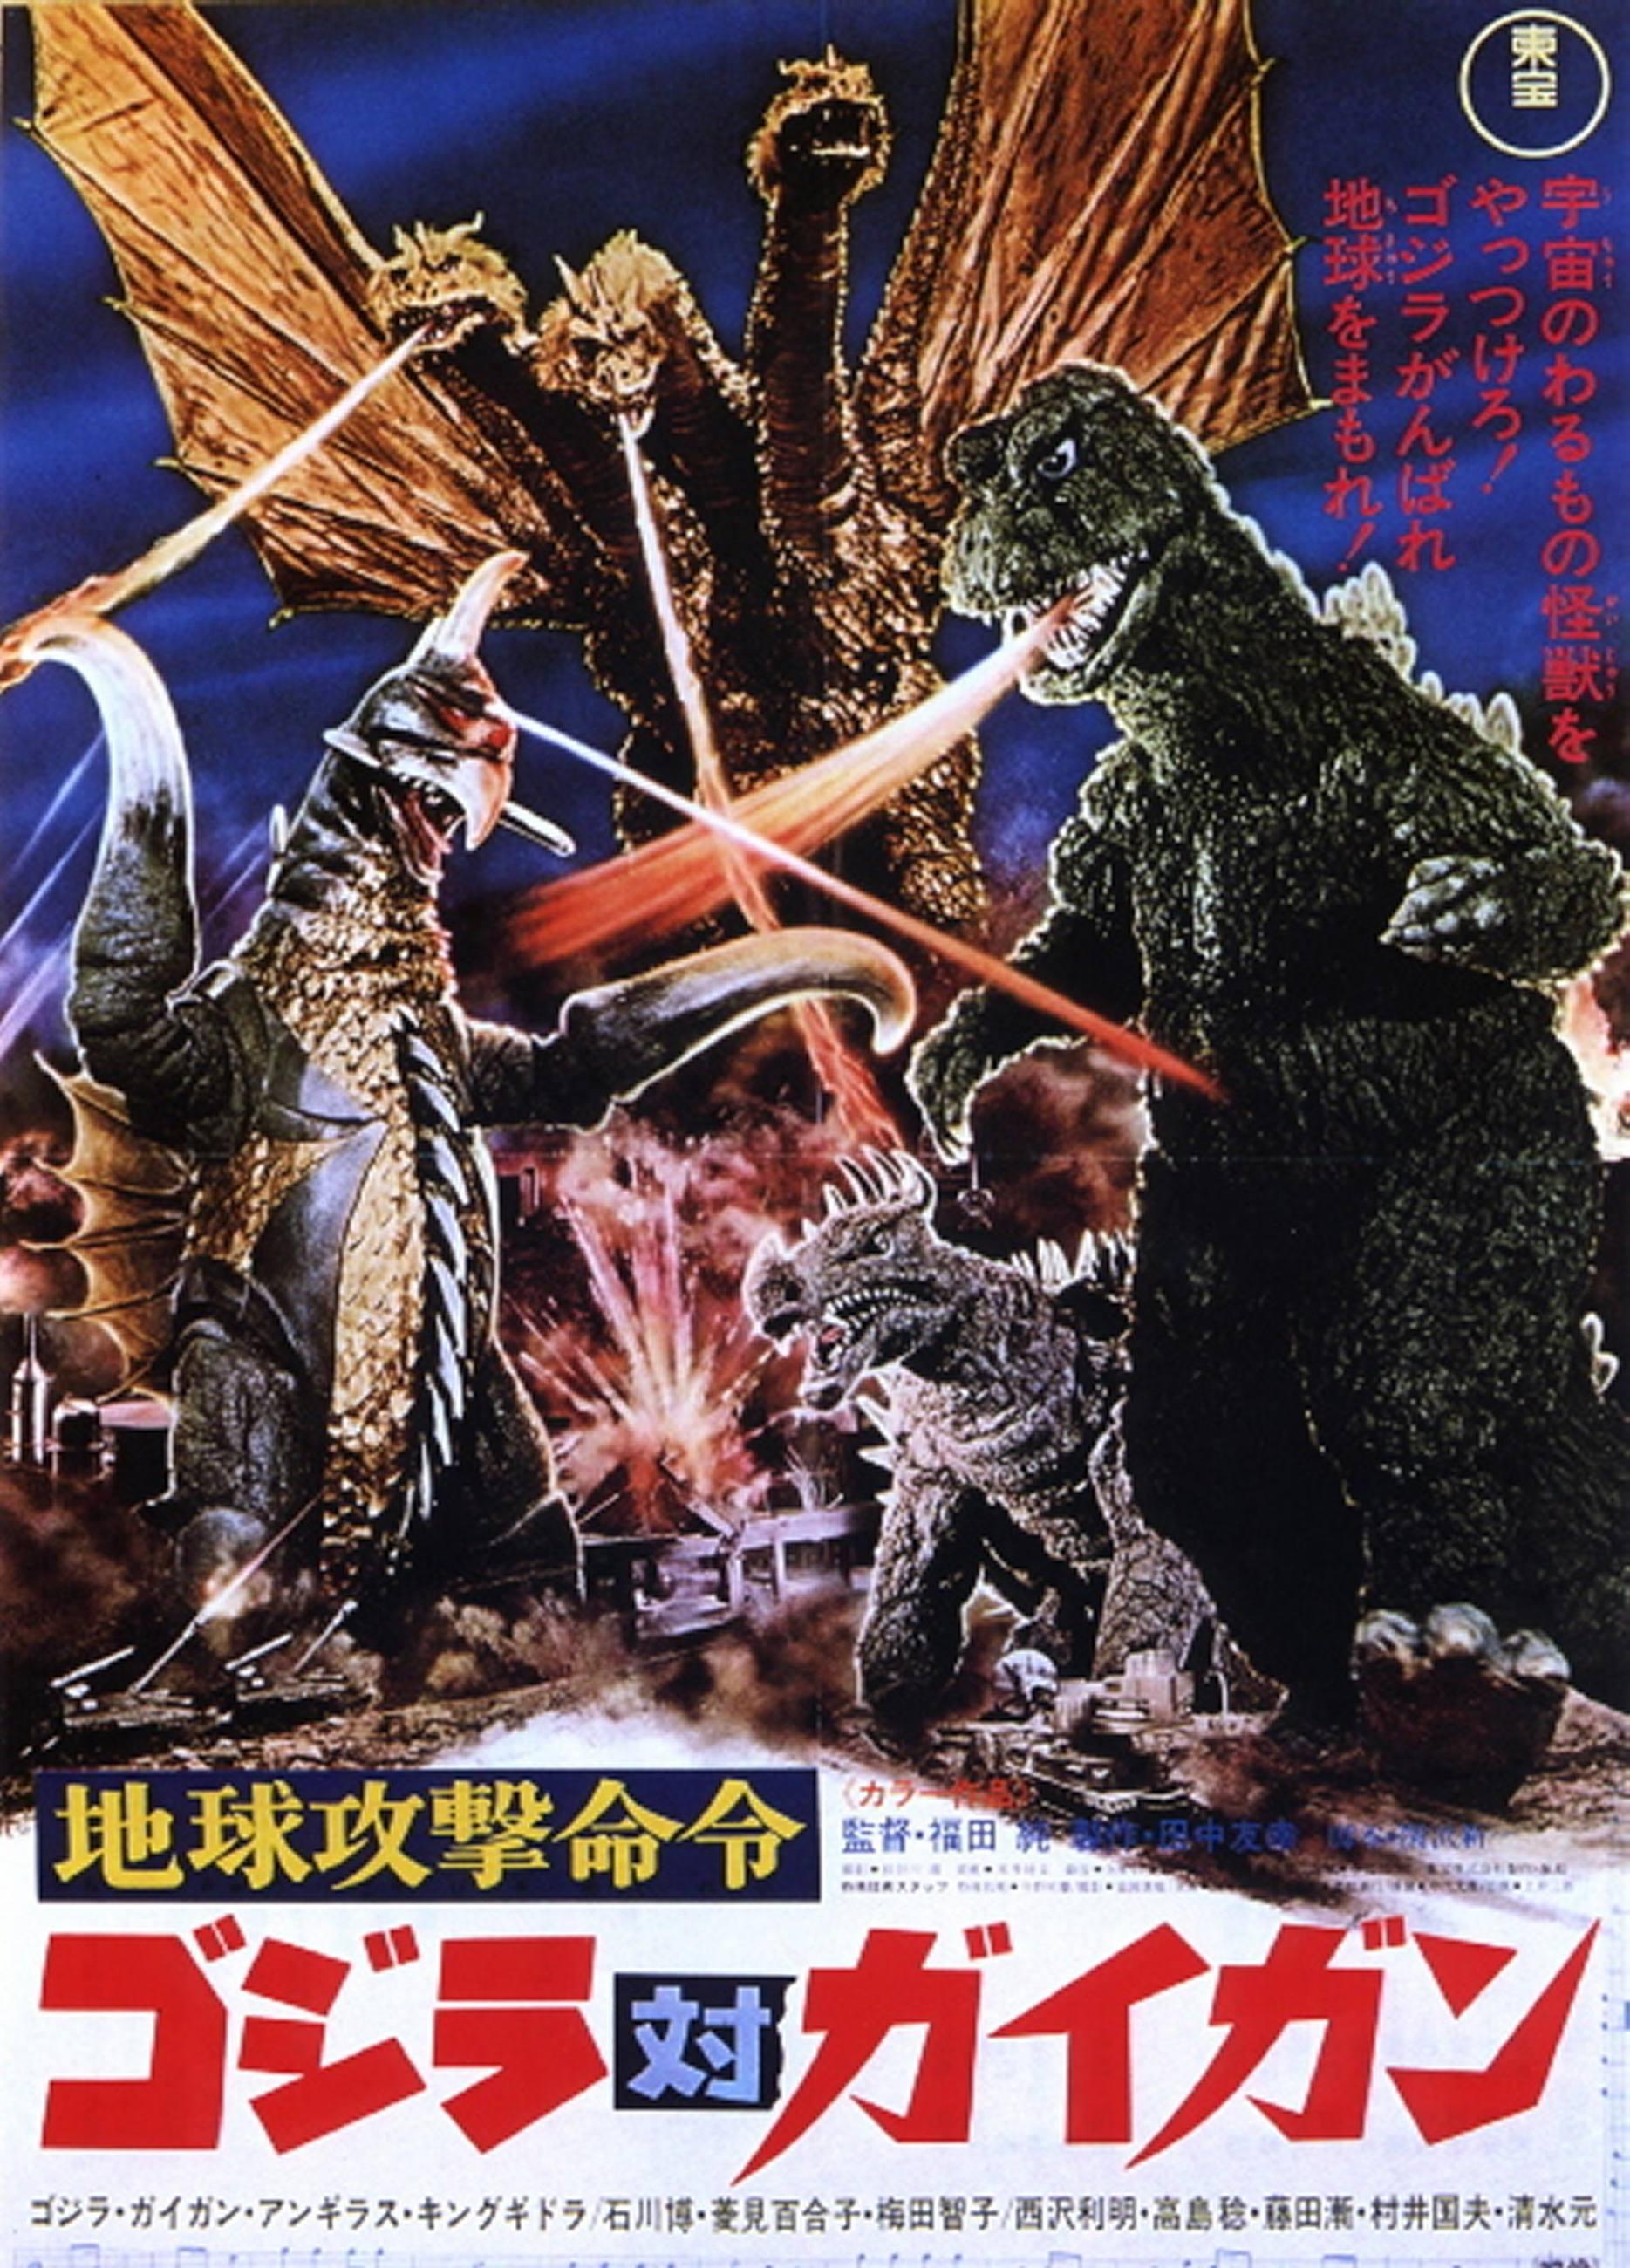 Godzilla vs. Gigan (1972) movie poster